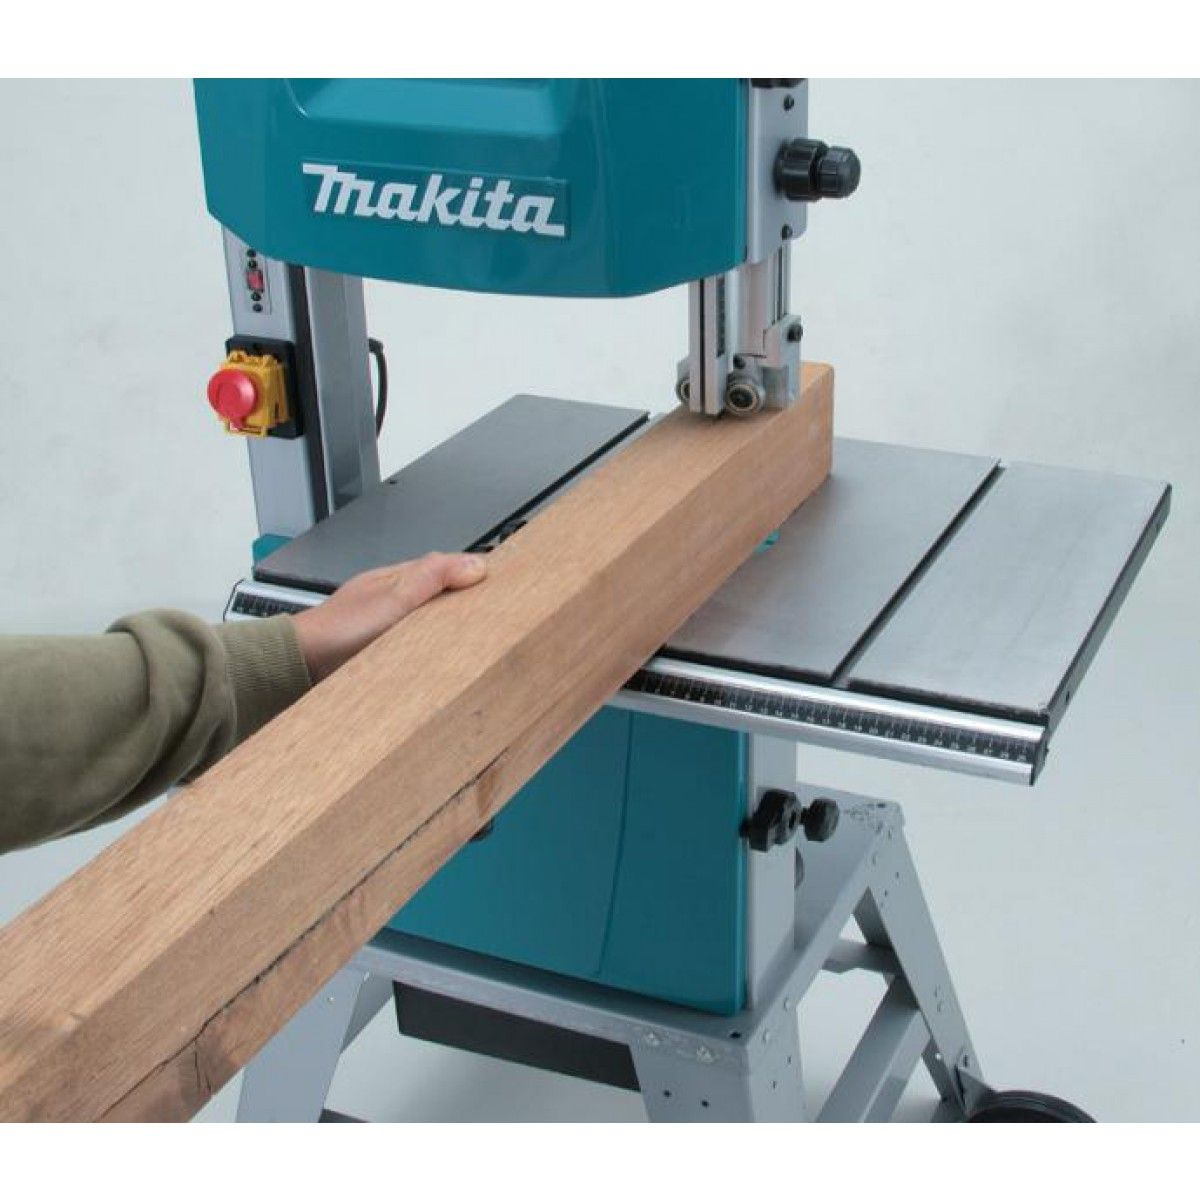 Sierra de cinta makita lb1200f herramientas makita - Sierras electricas para madera ...